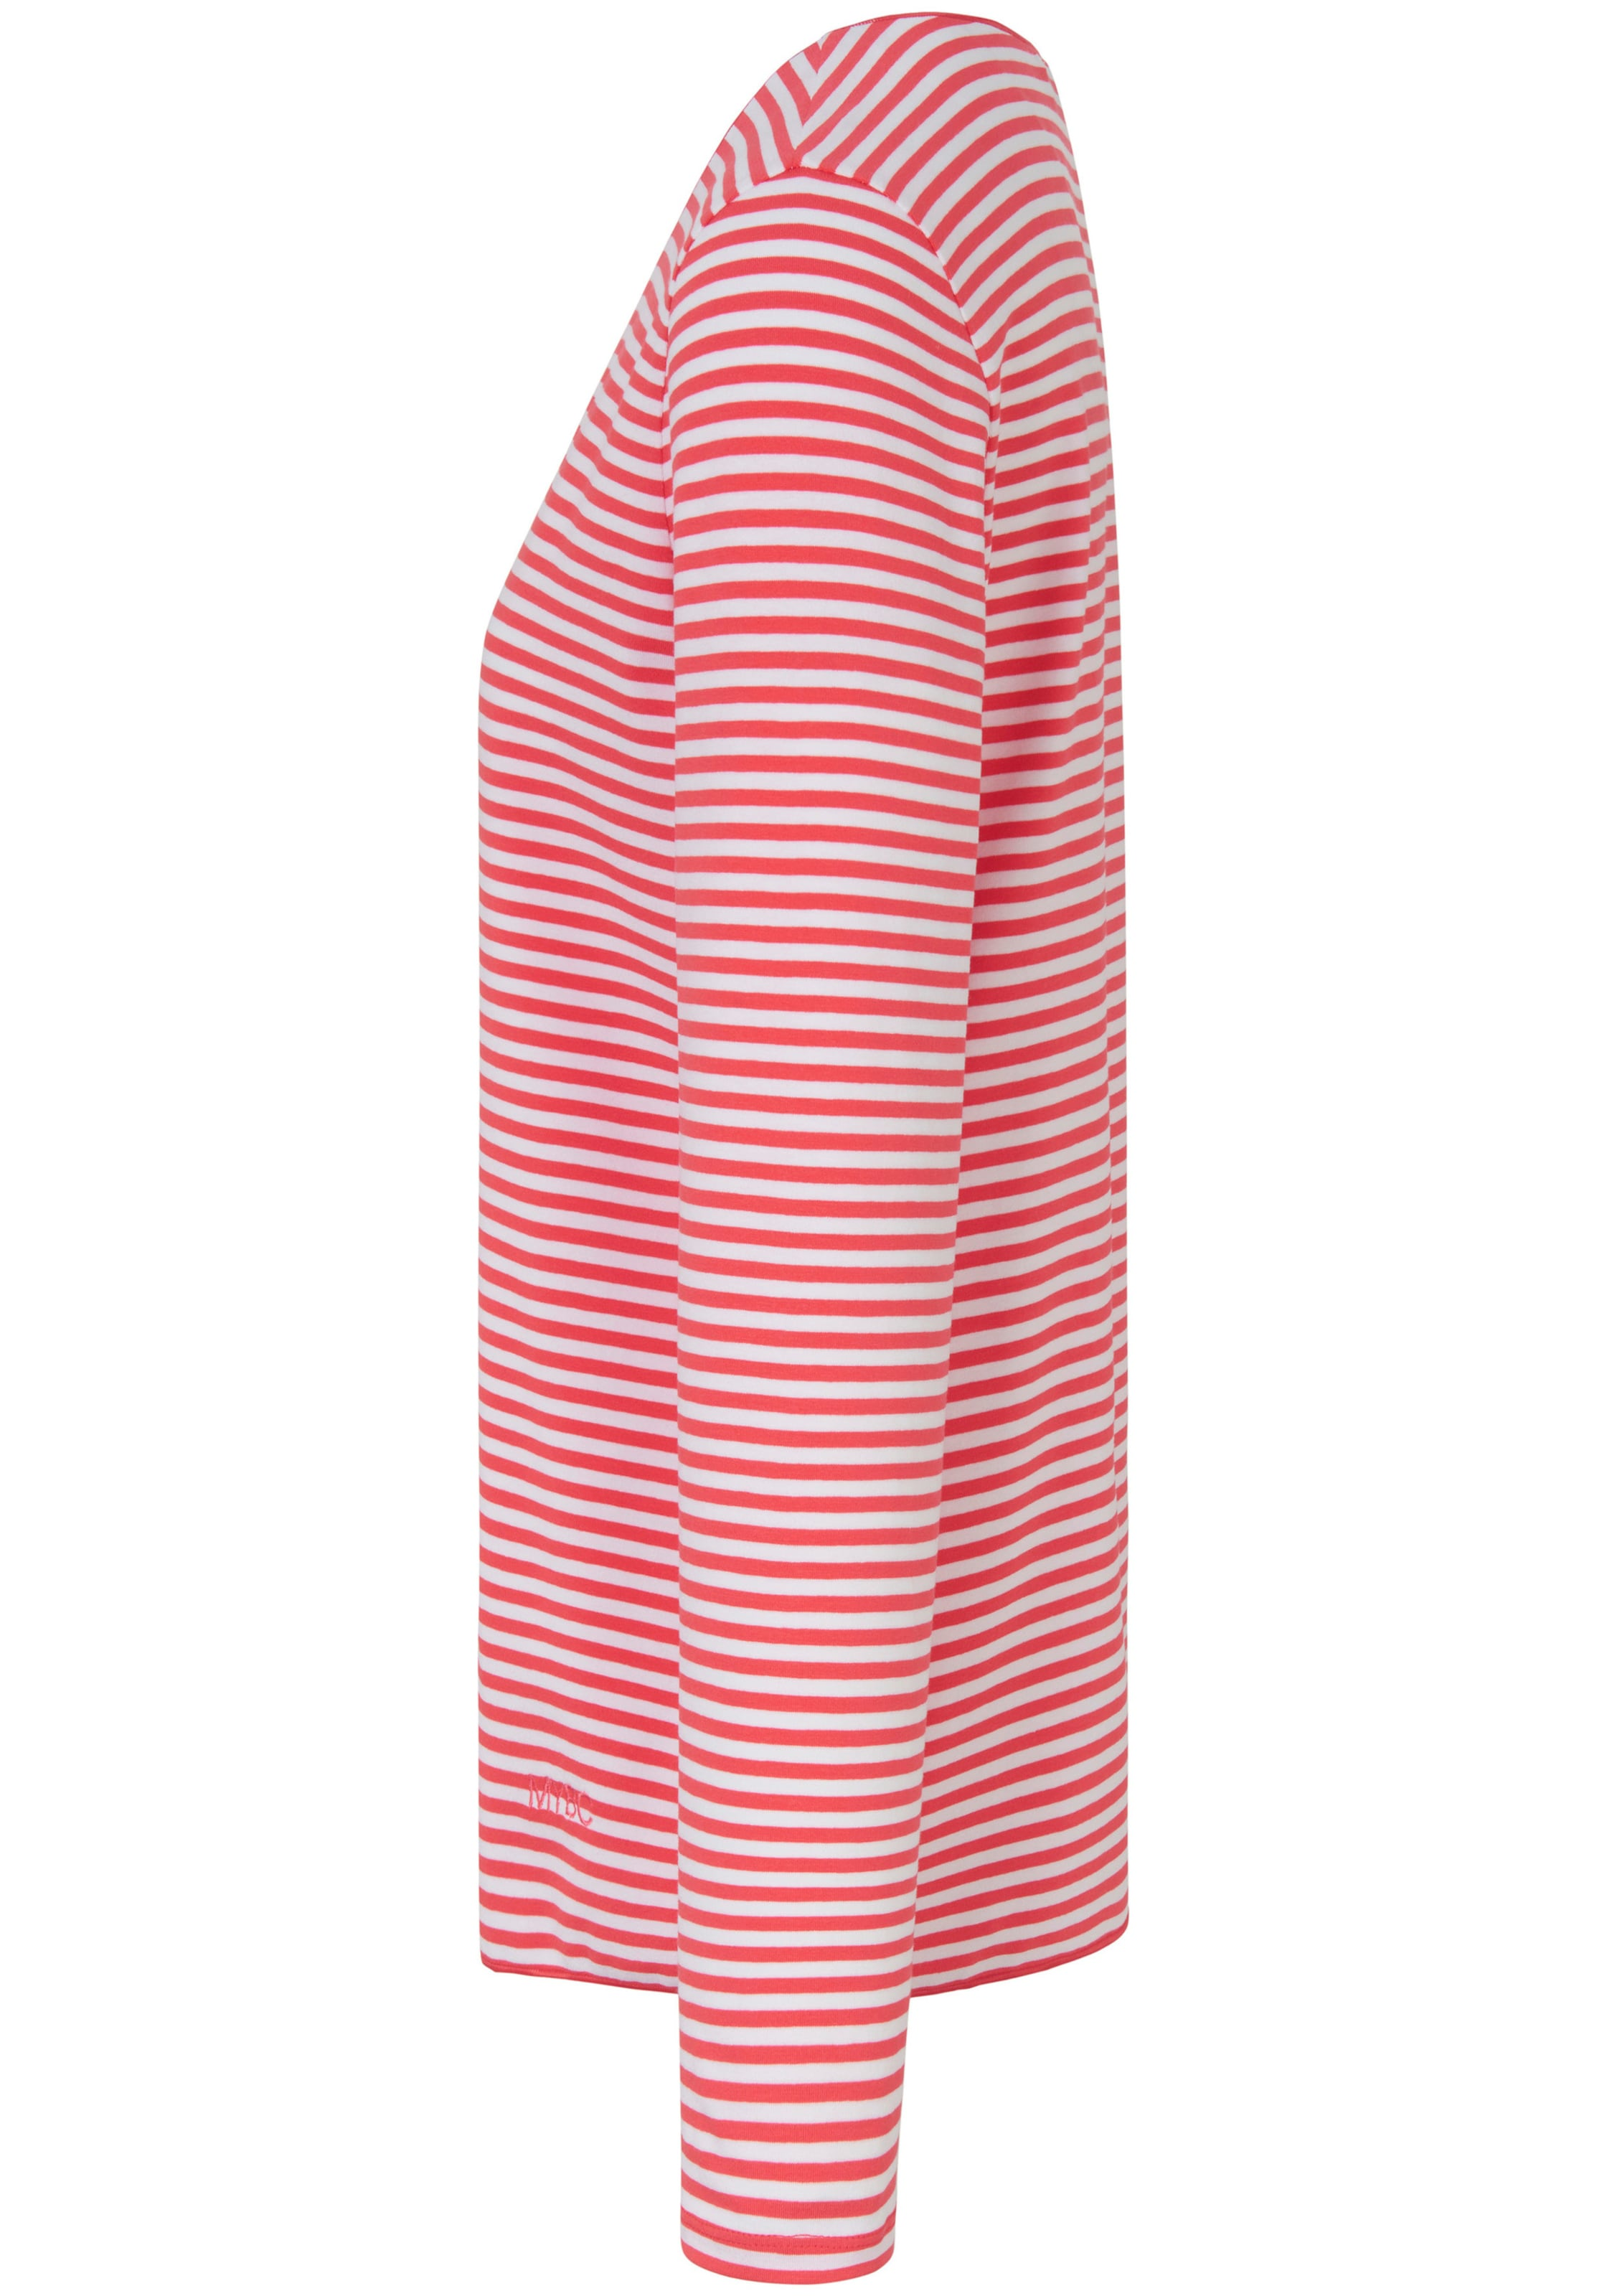 Mybc Shirt Shirt In Mybc In KoralleWeiß Mybc KoralleWeiß Shirt In Mybc KoralleWeiß 354AjRLq